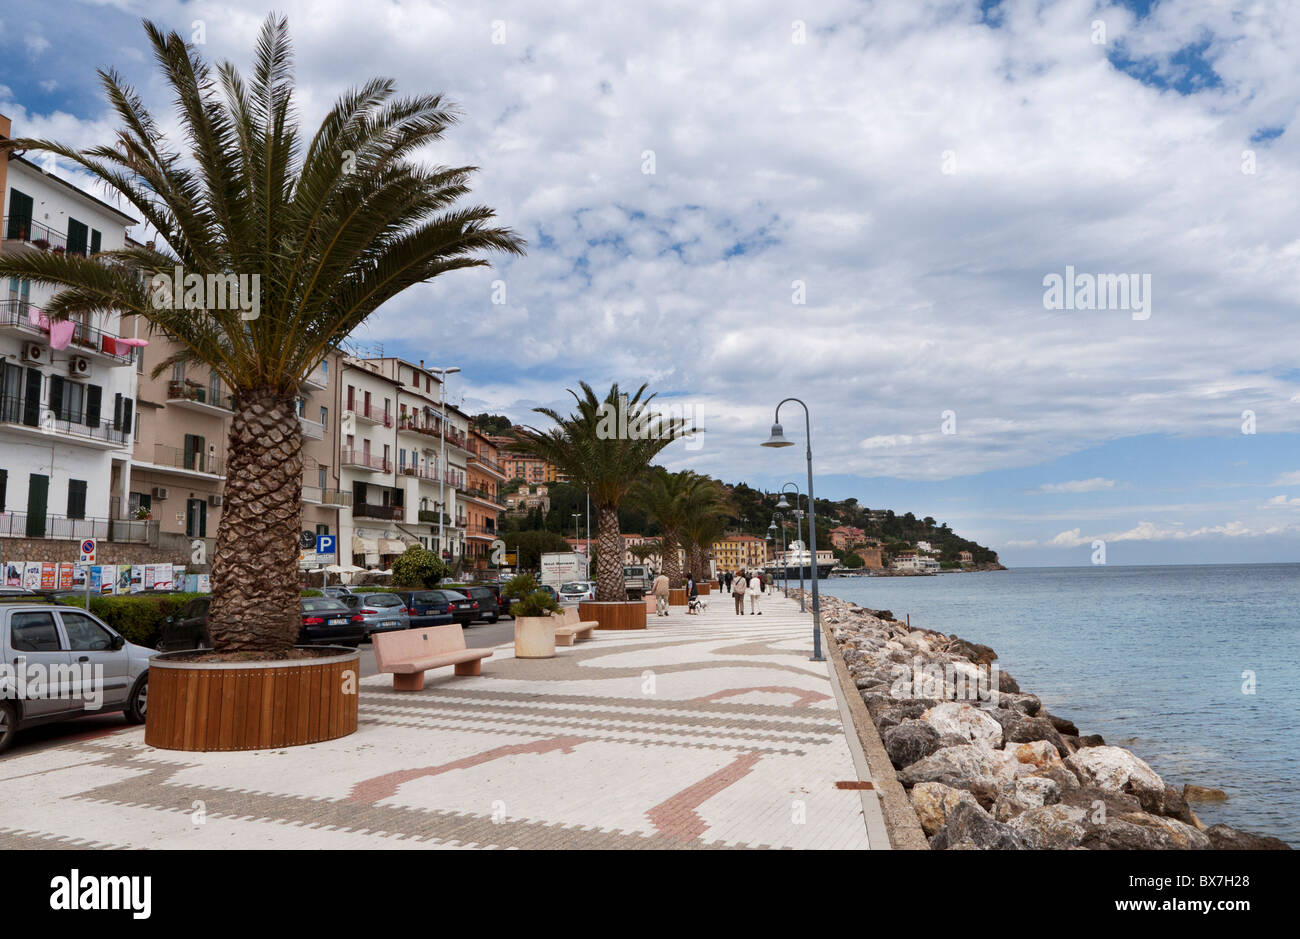 Porto Santo Stefano, Monte Argentario, Tuscany, Italy - Stock Image